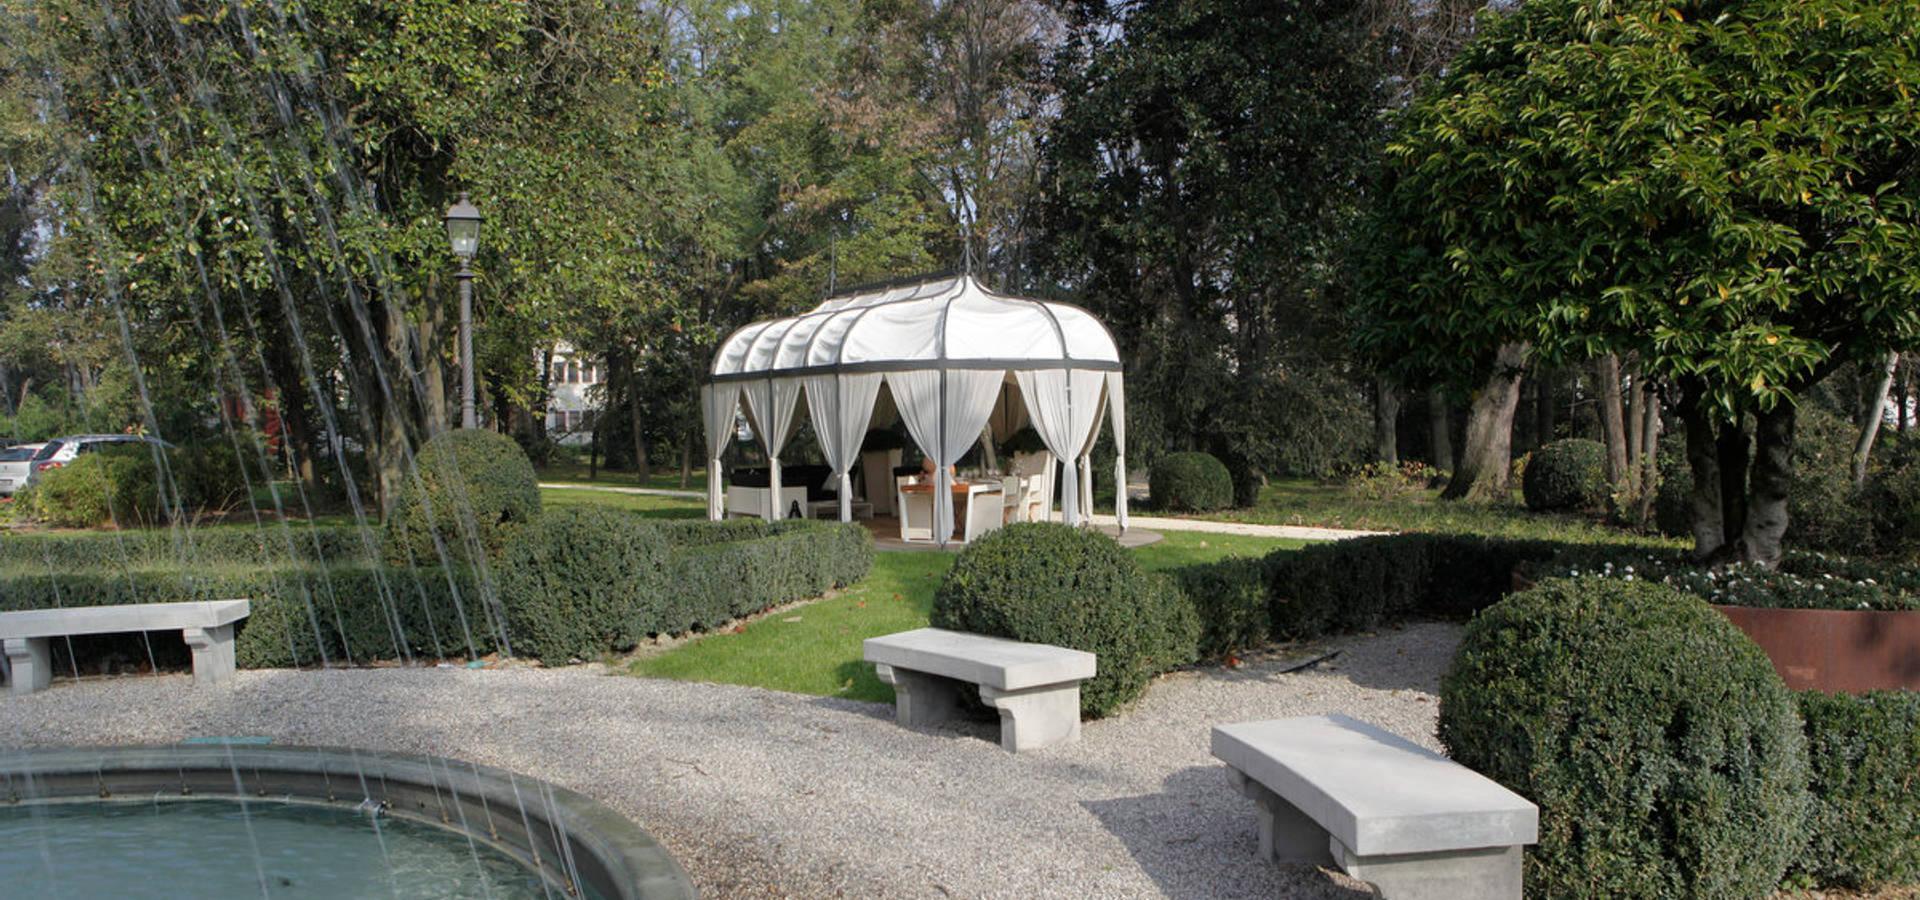 Odue Modena—Concept Store